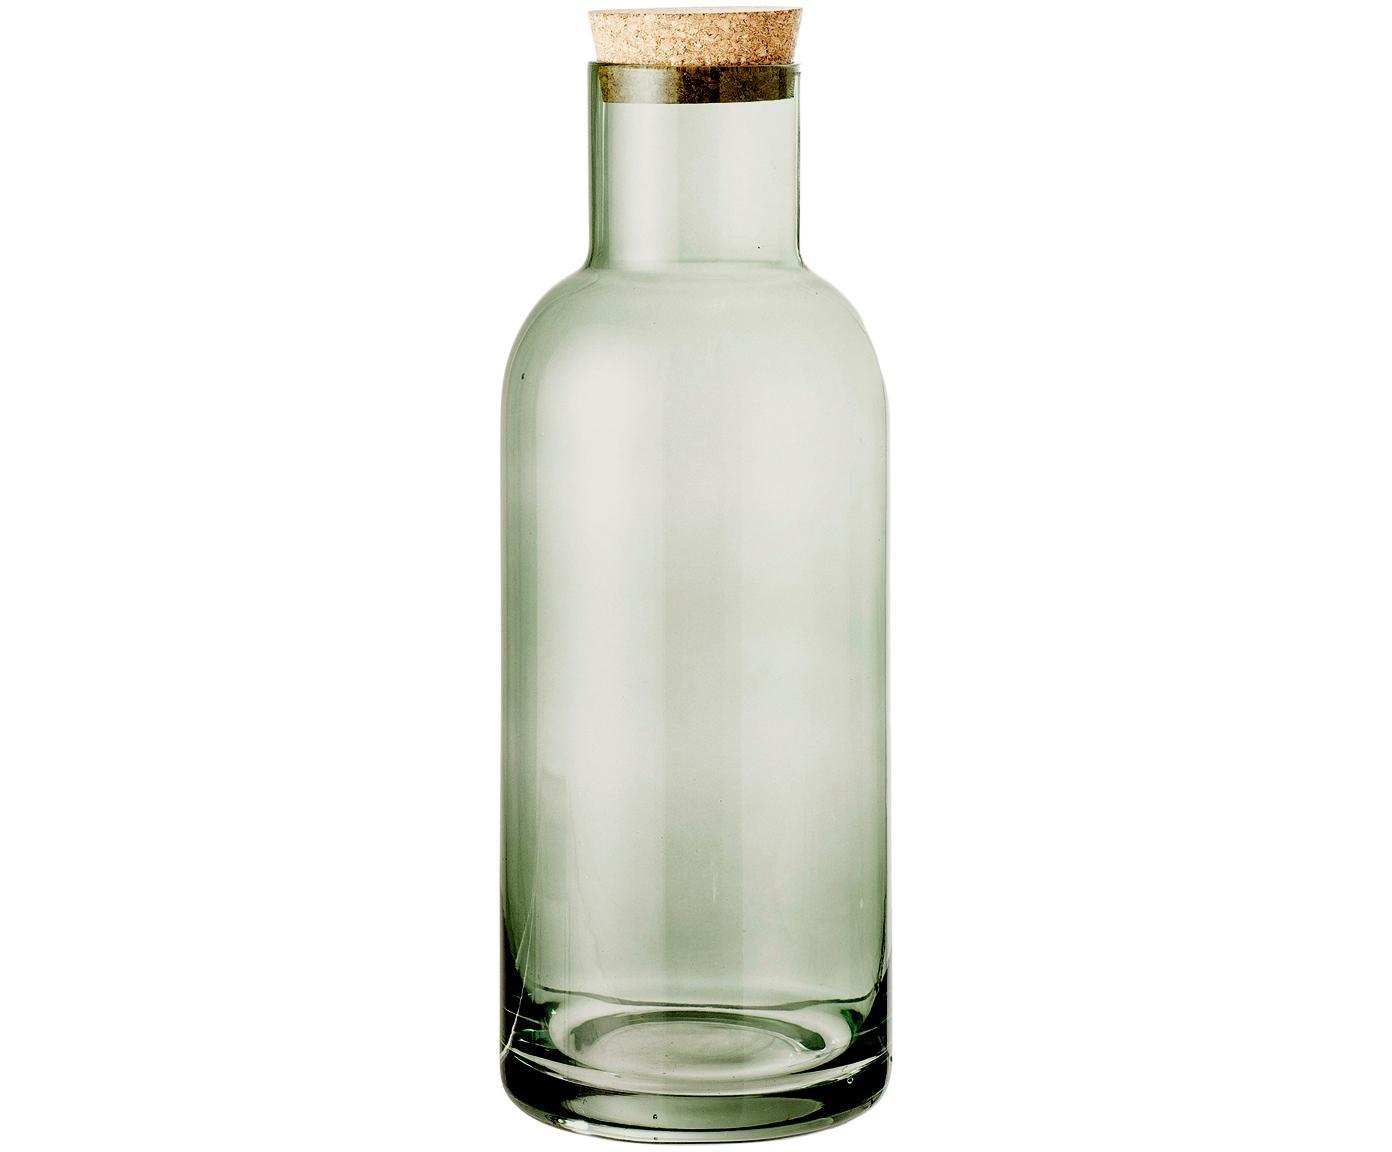 Karaf Clearance, Deksel: kurk, Groen, transparant, 1 L